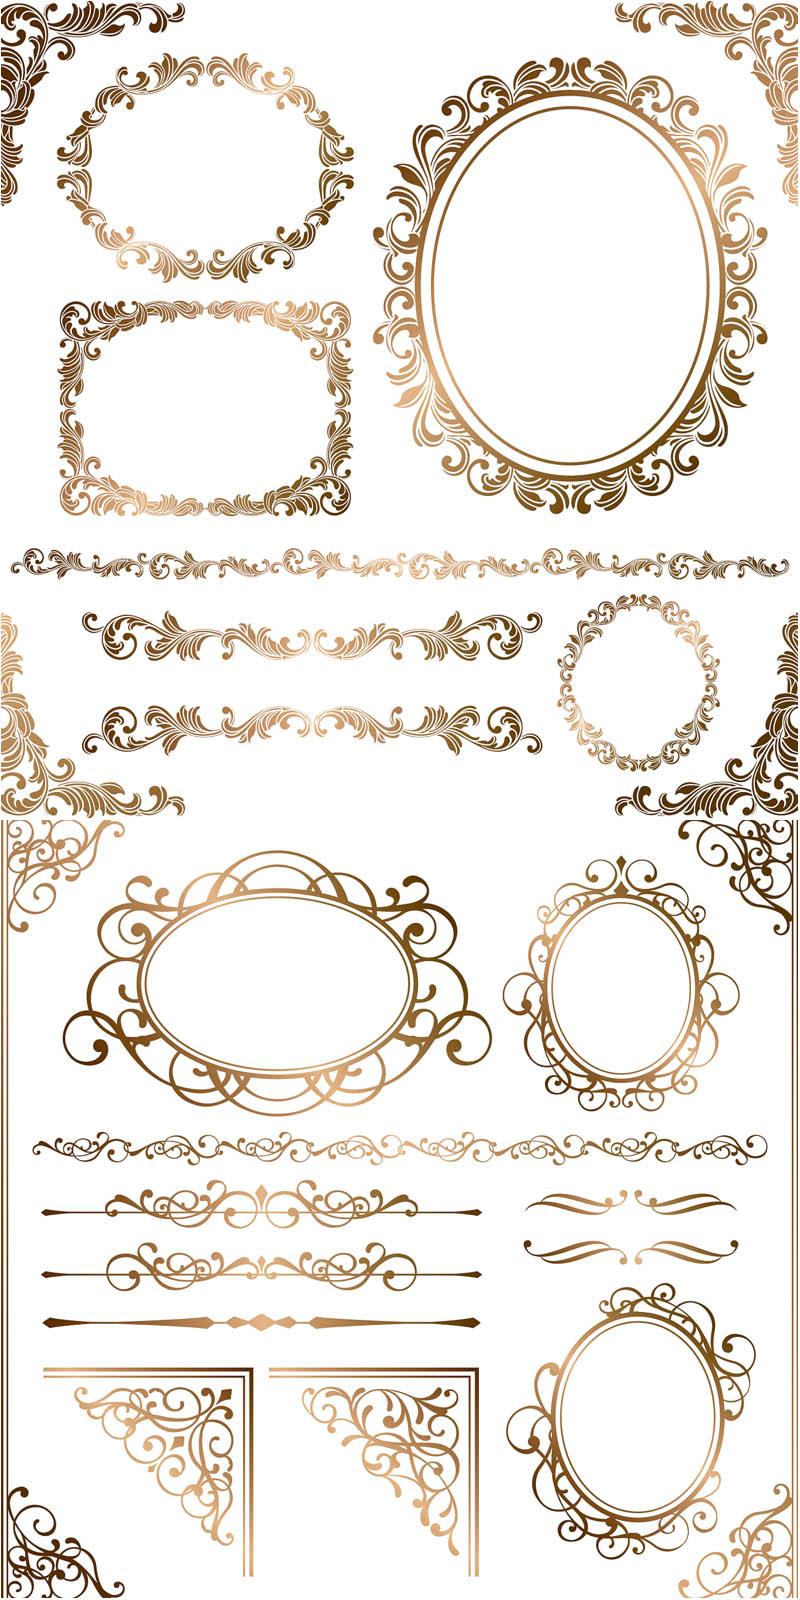 18 Baroque Frame Vector Border Images